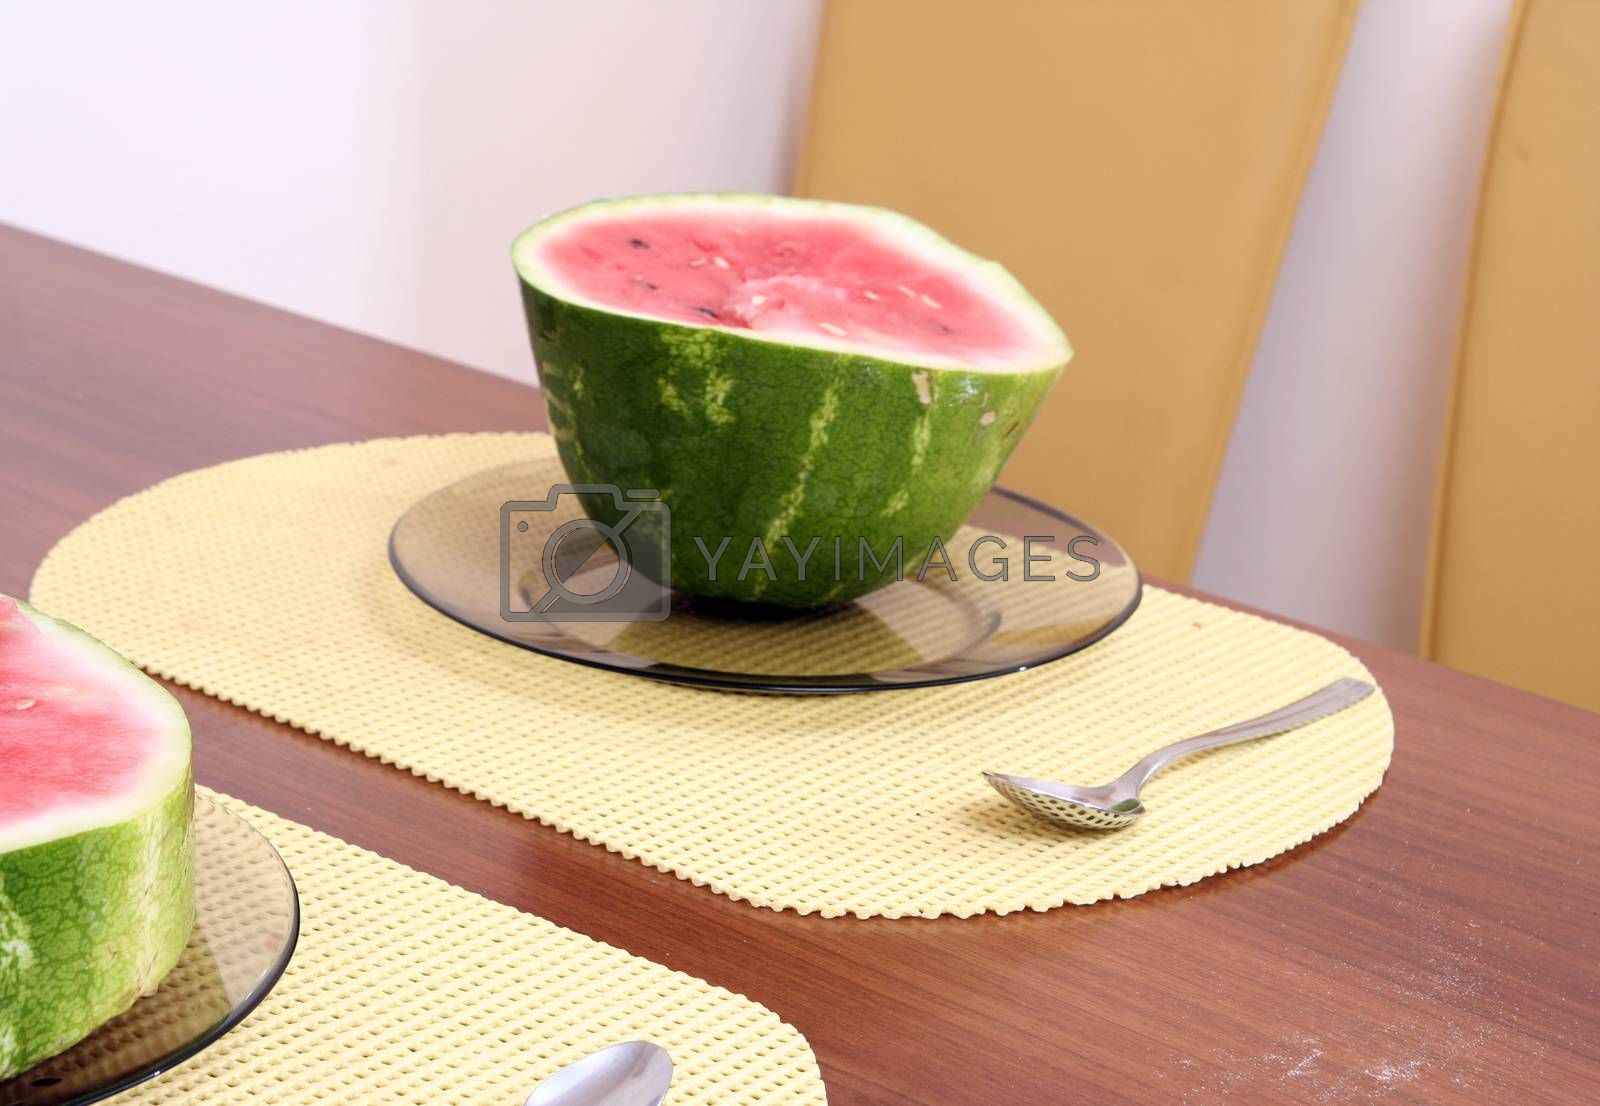 A slice of juicy water melon